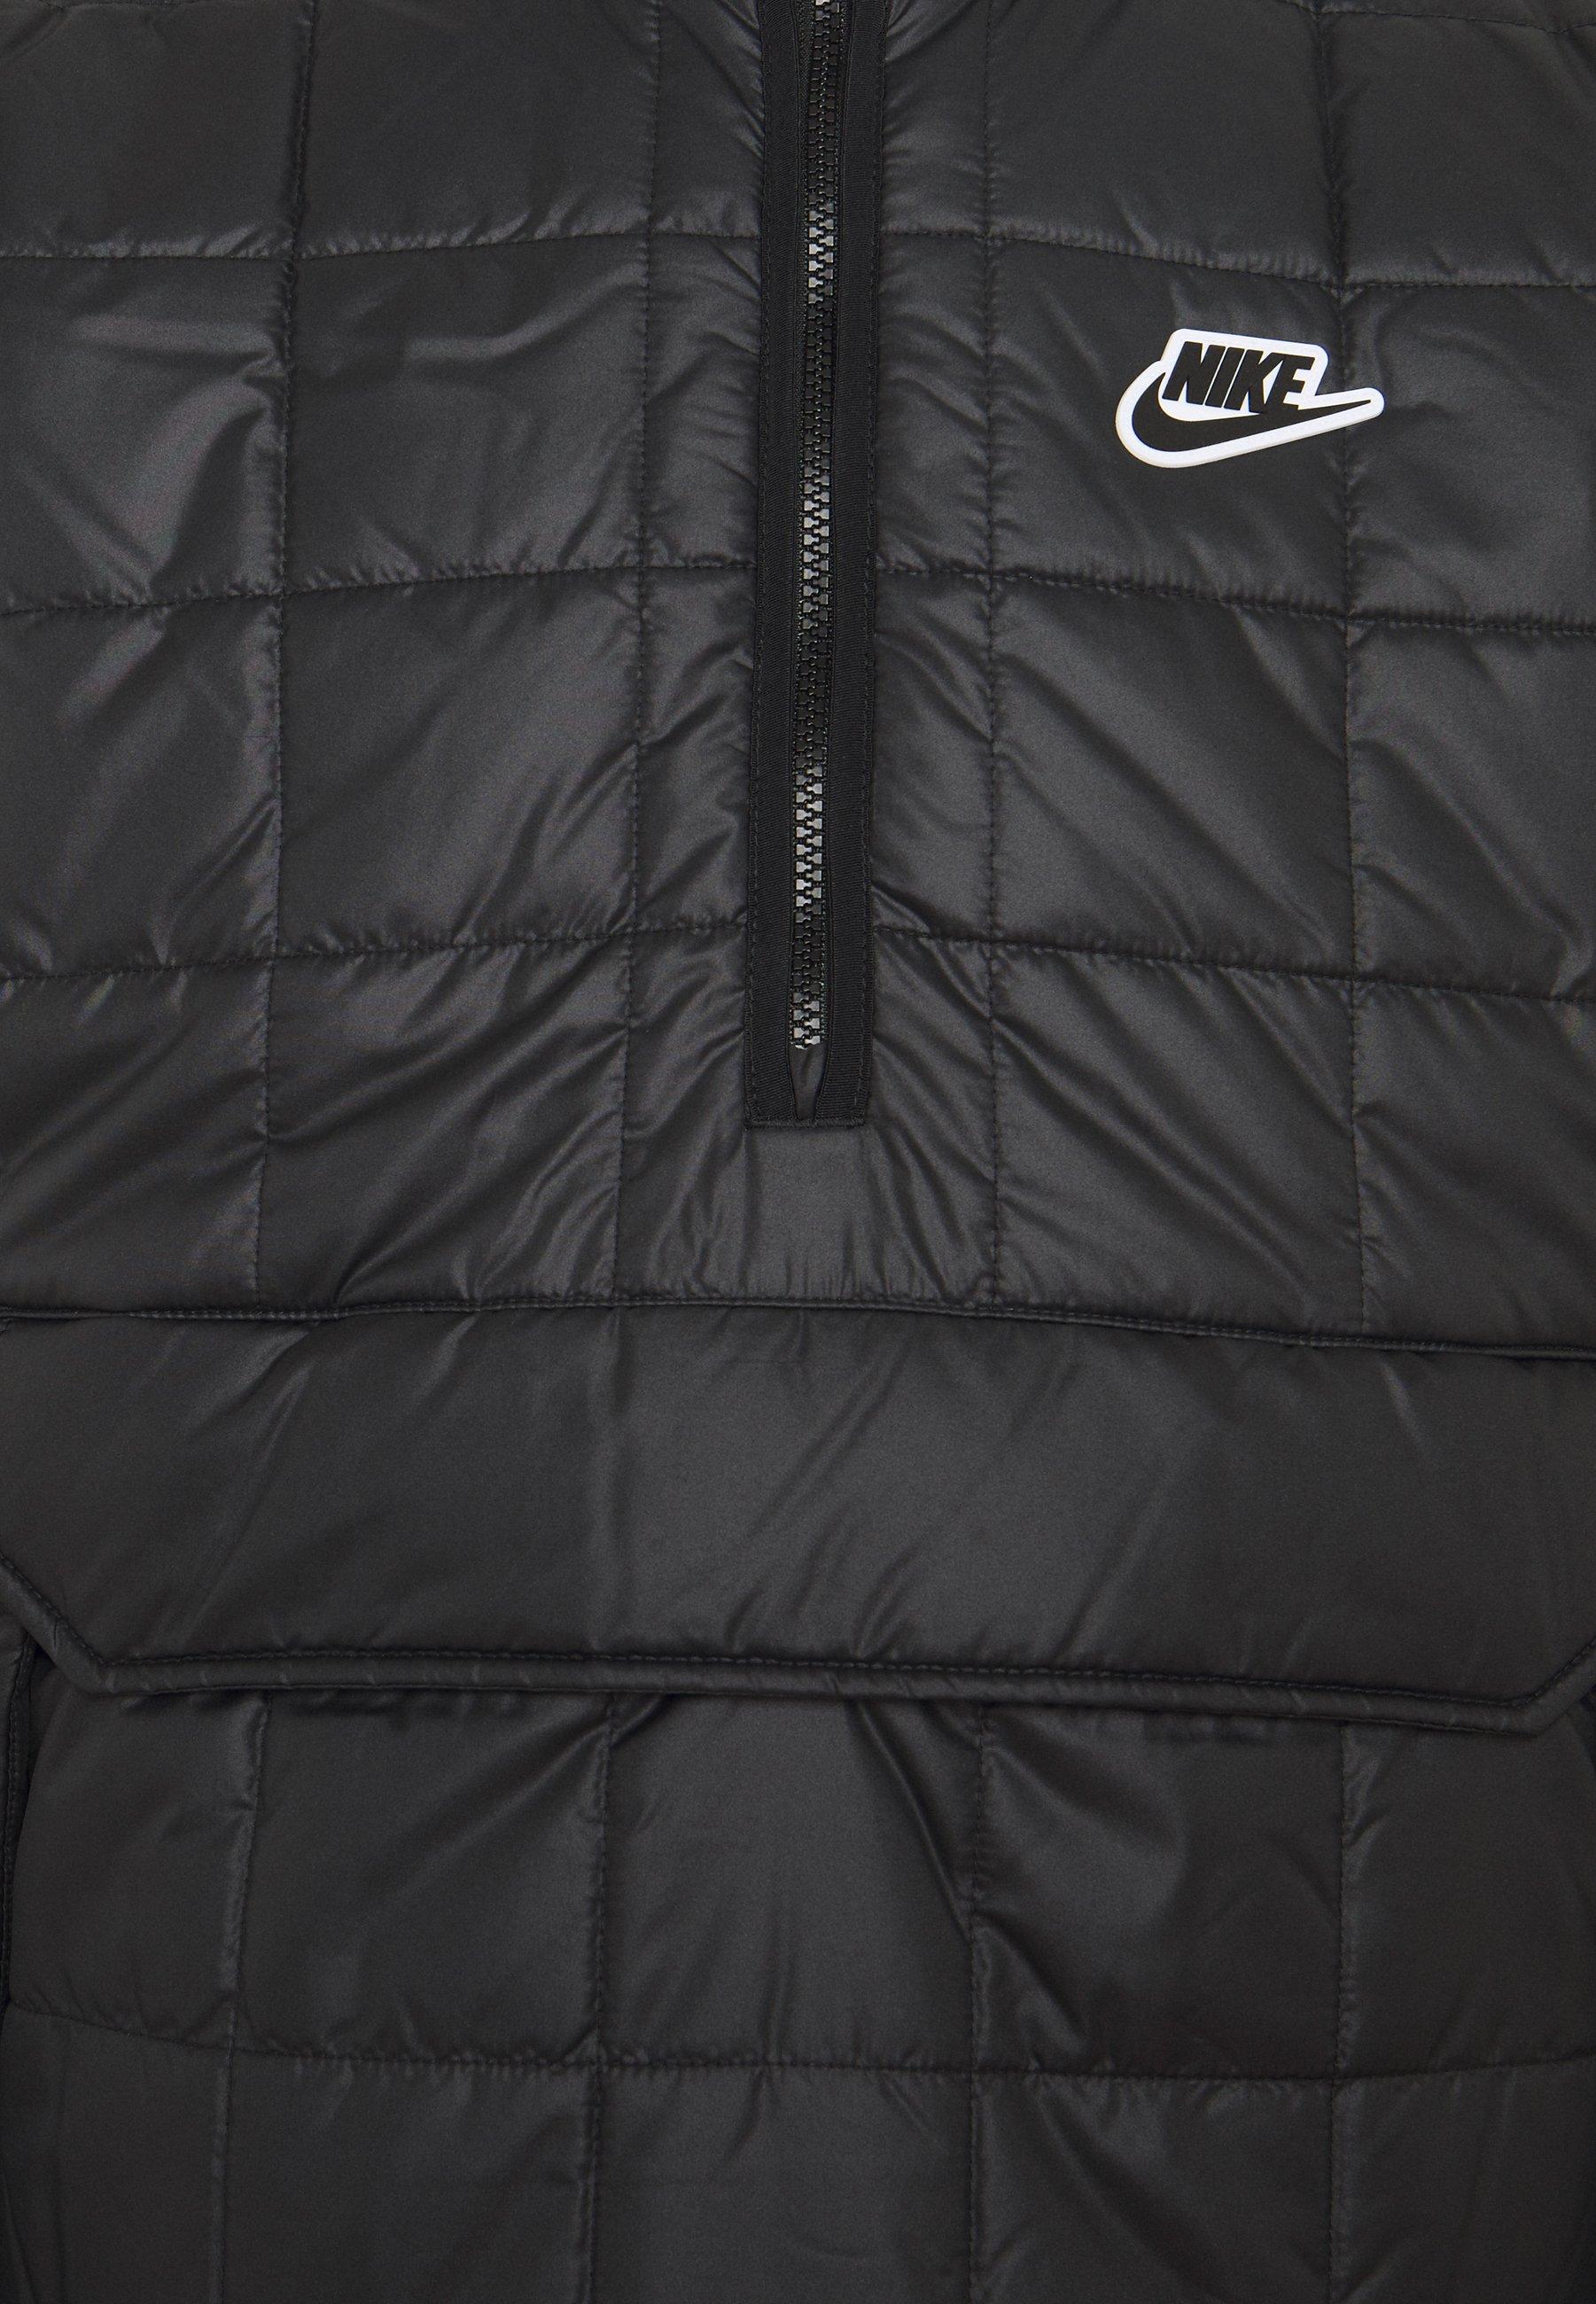 Marcha mala Encantador Montañas climáticas  Wholesale Quality Wholesale Nike Sportswear Light jacket - black | men's  clothing 2020 B5dHH